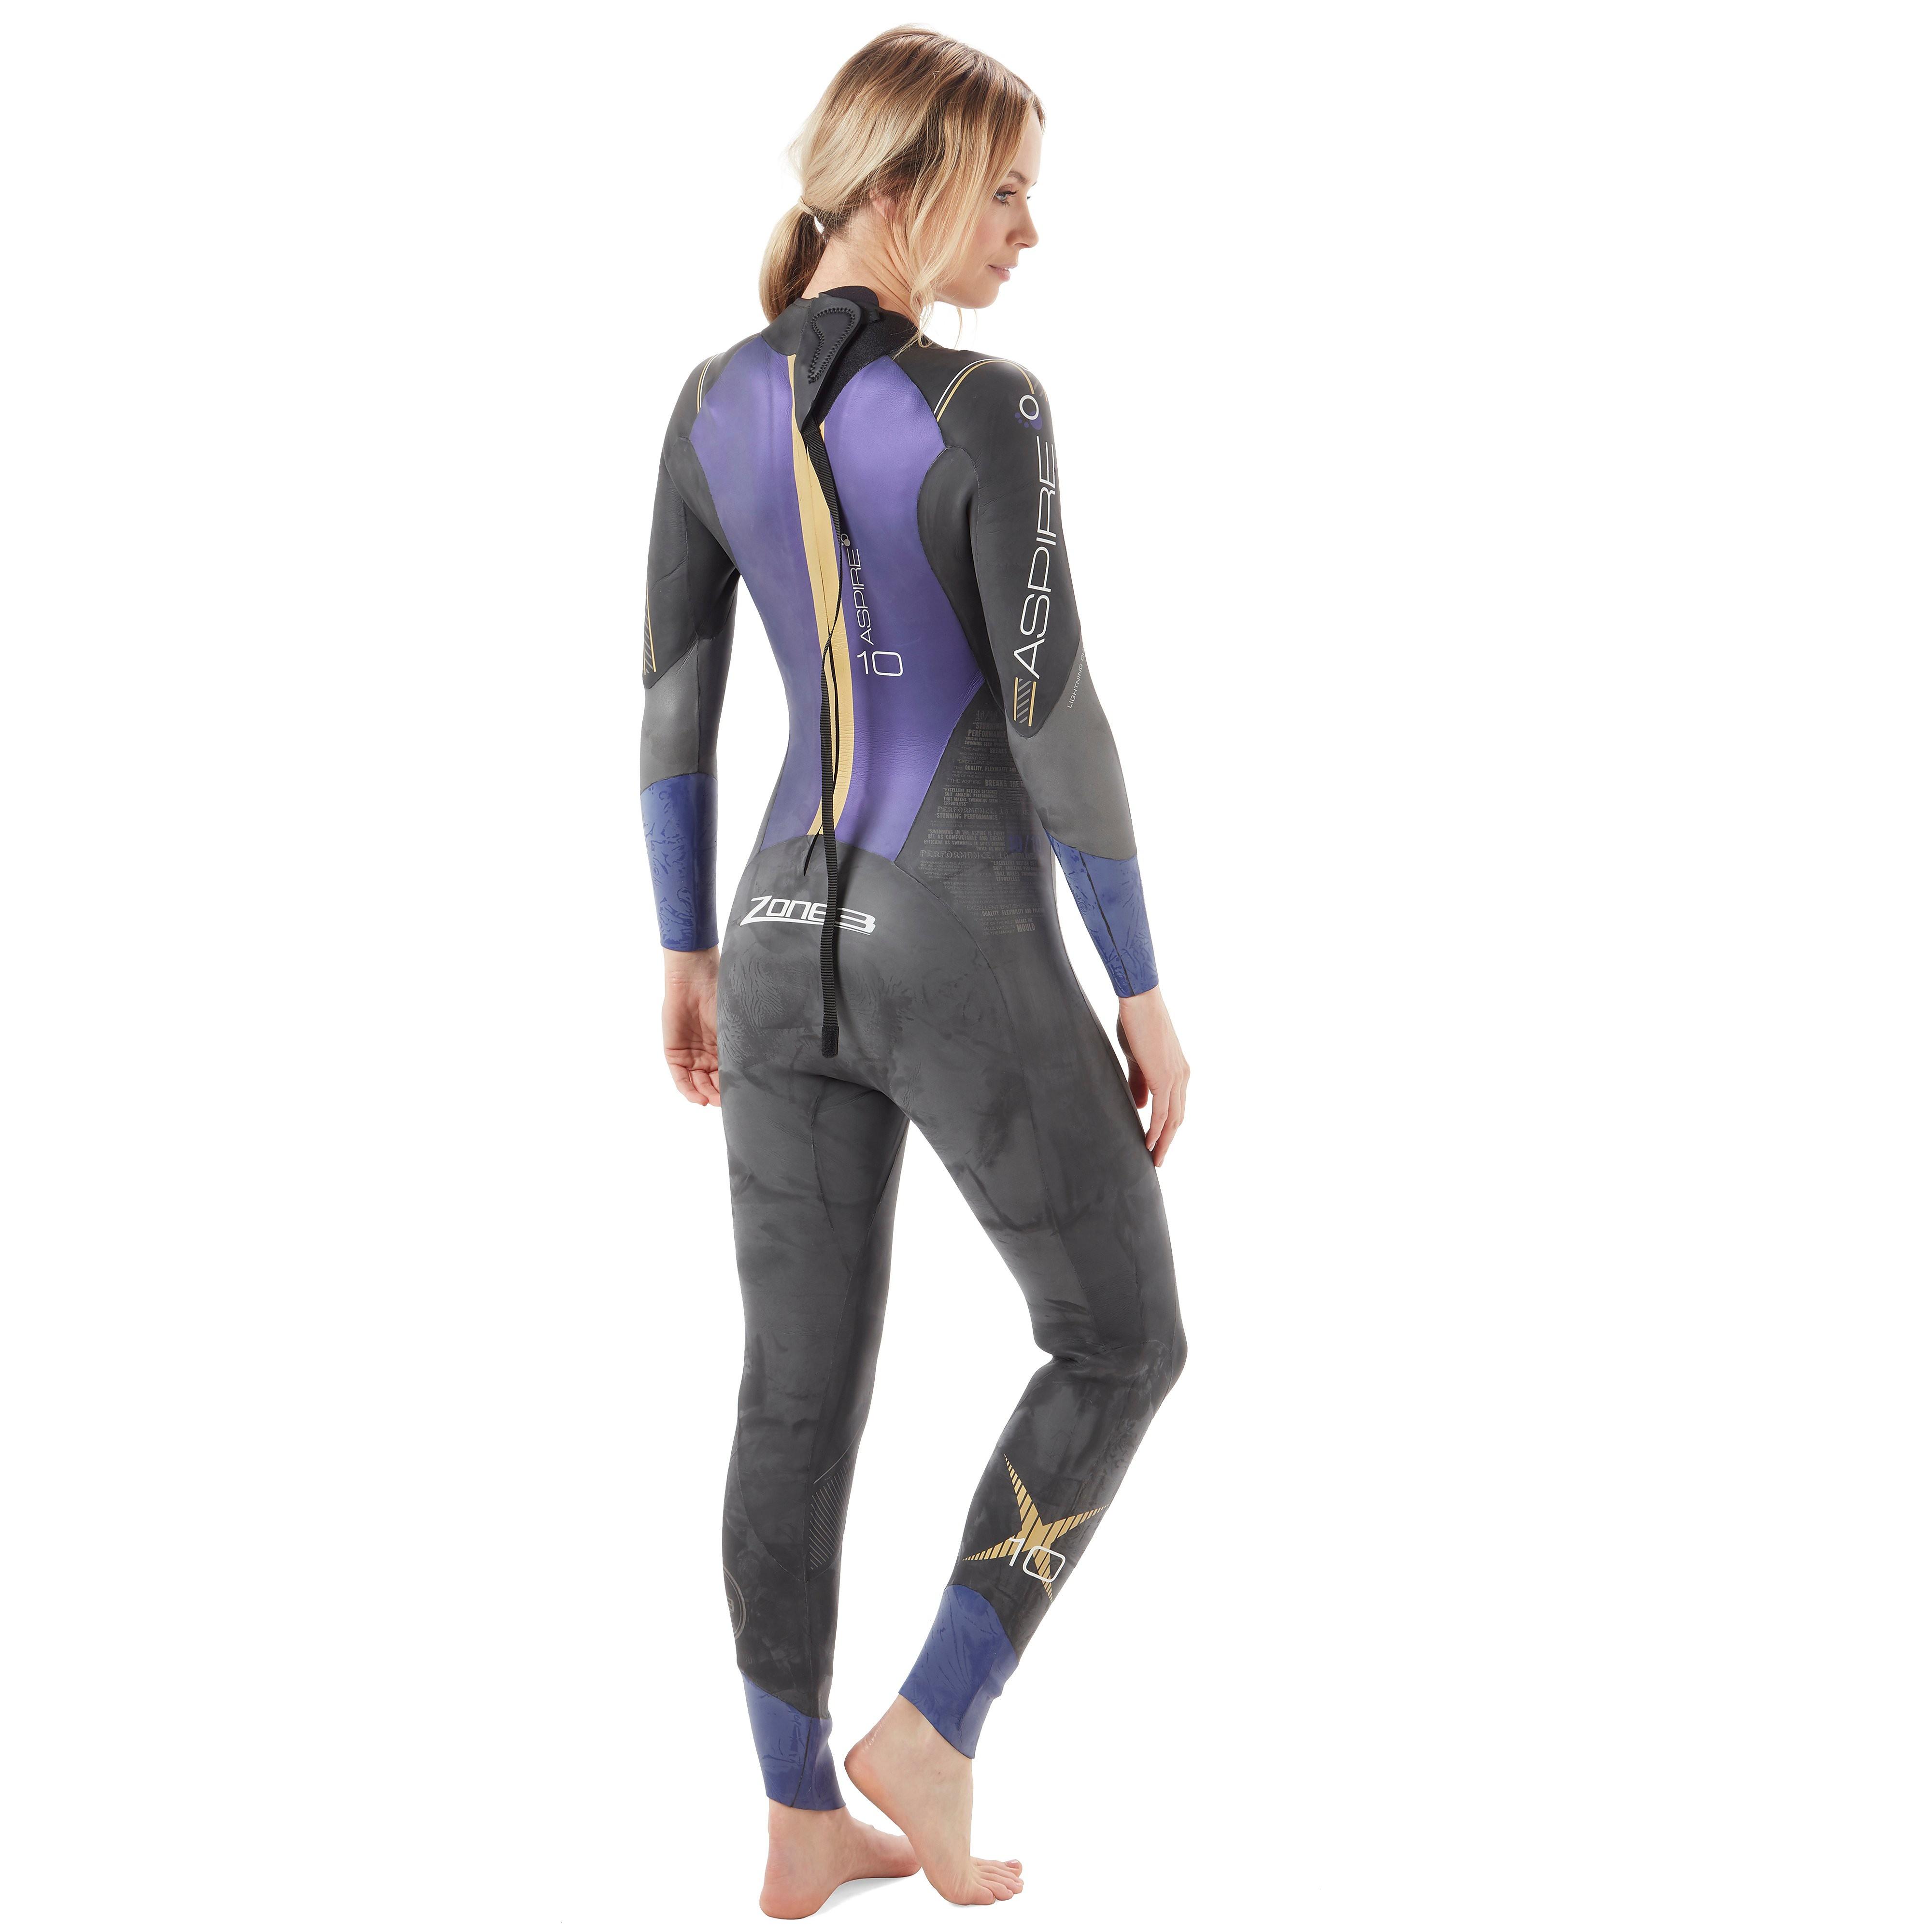 Zone 3 Aspire Women's Wetsuit